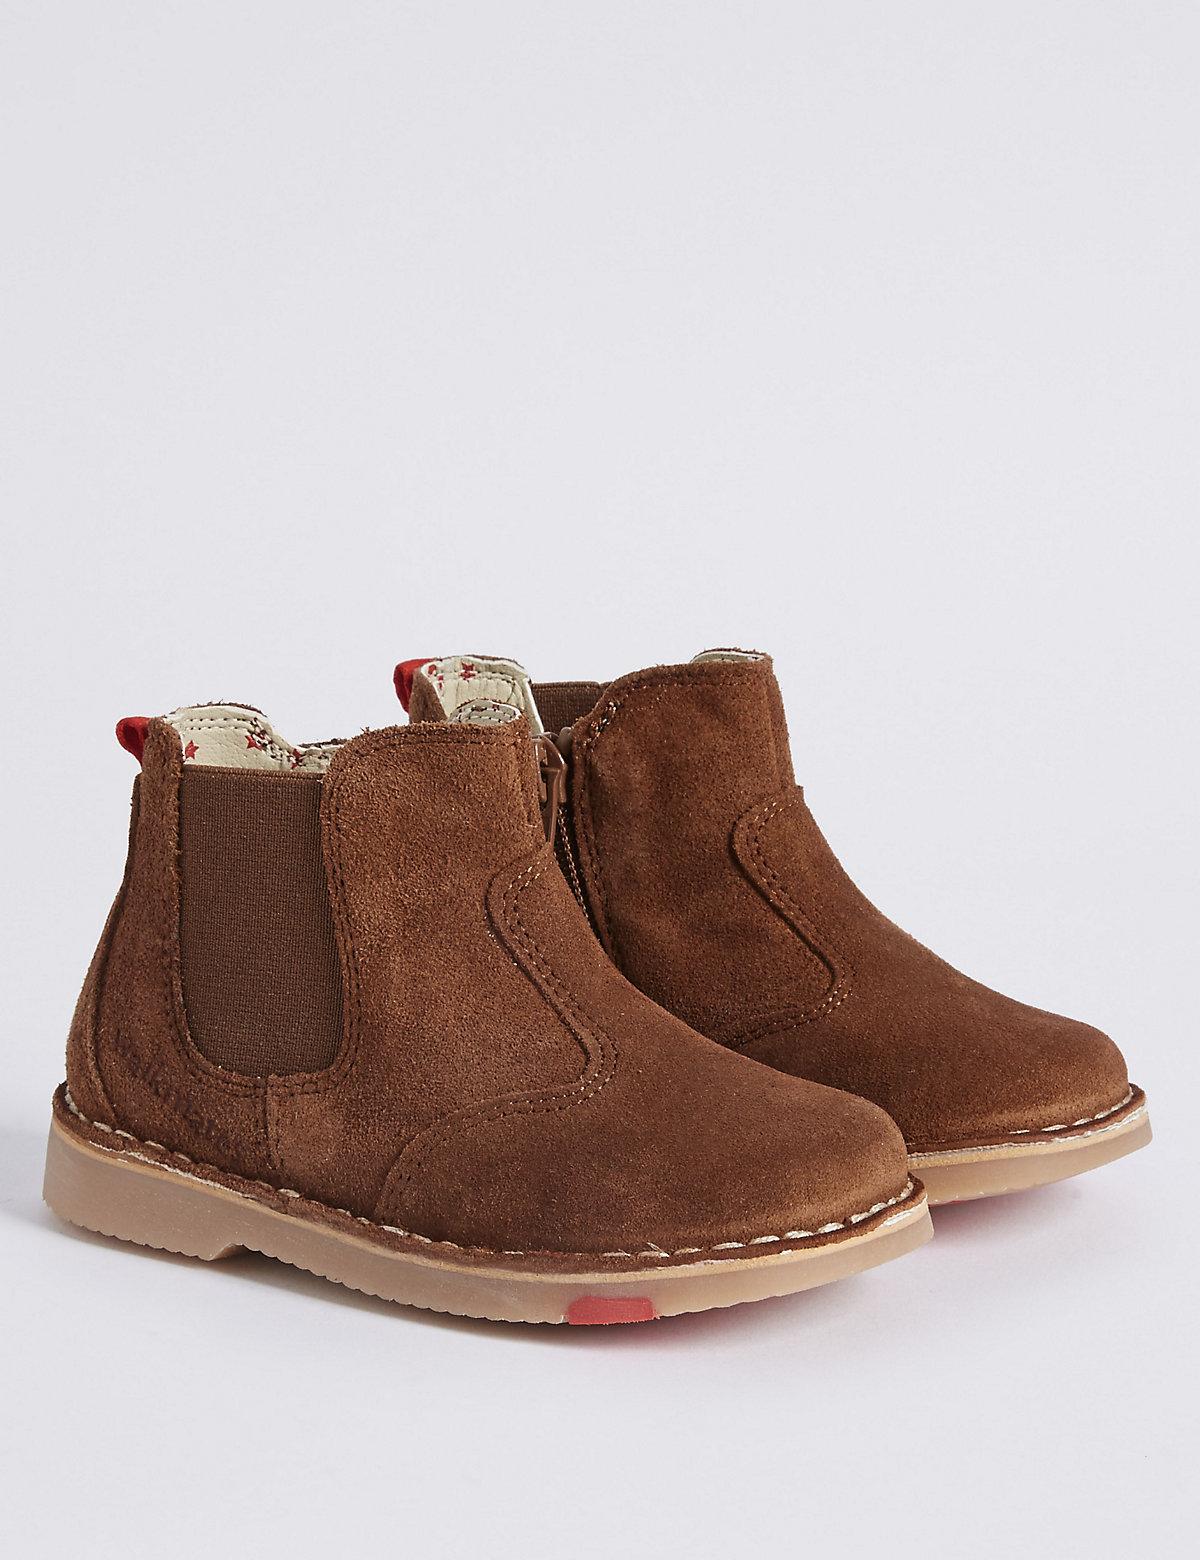 Walkmates Kids' Suede Walkmates Chelsea Boots